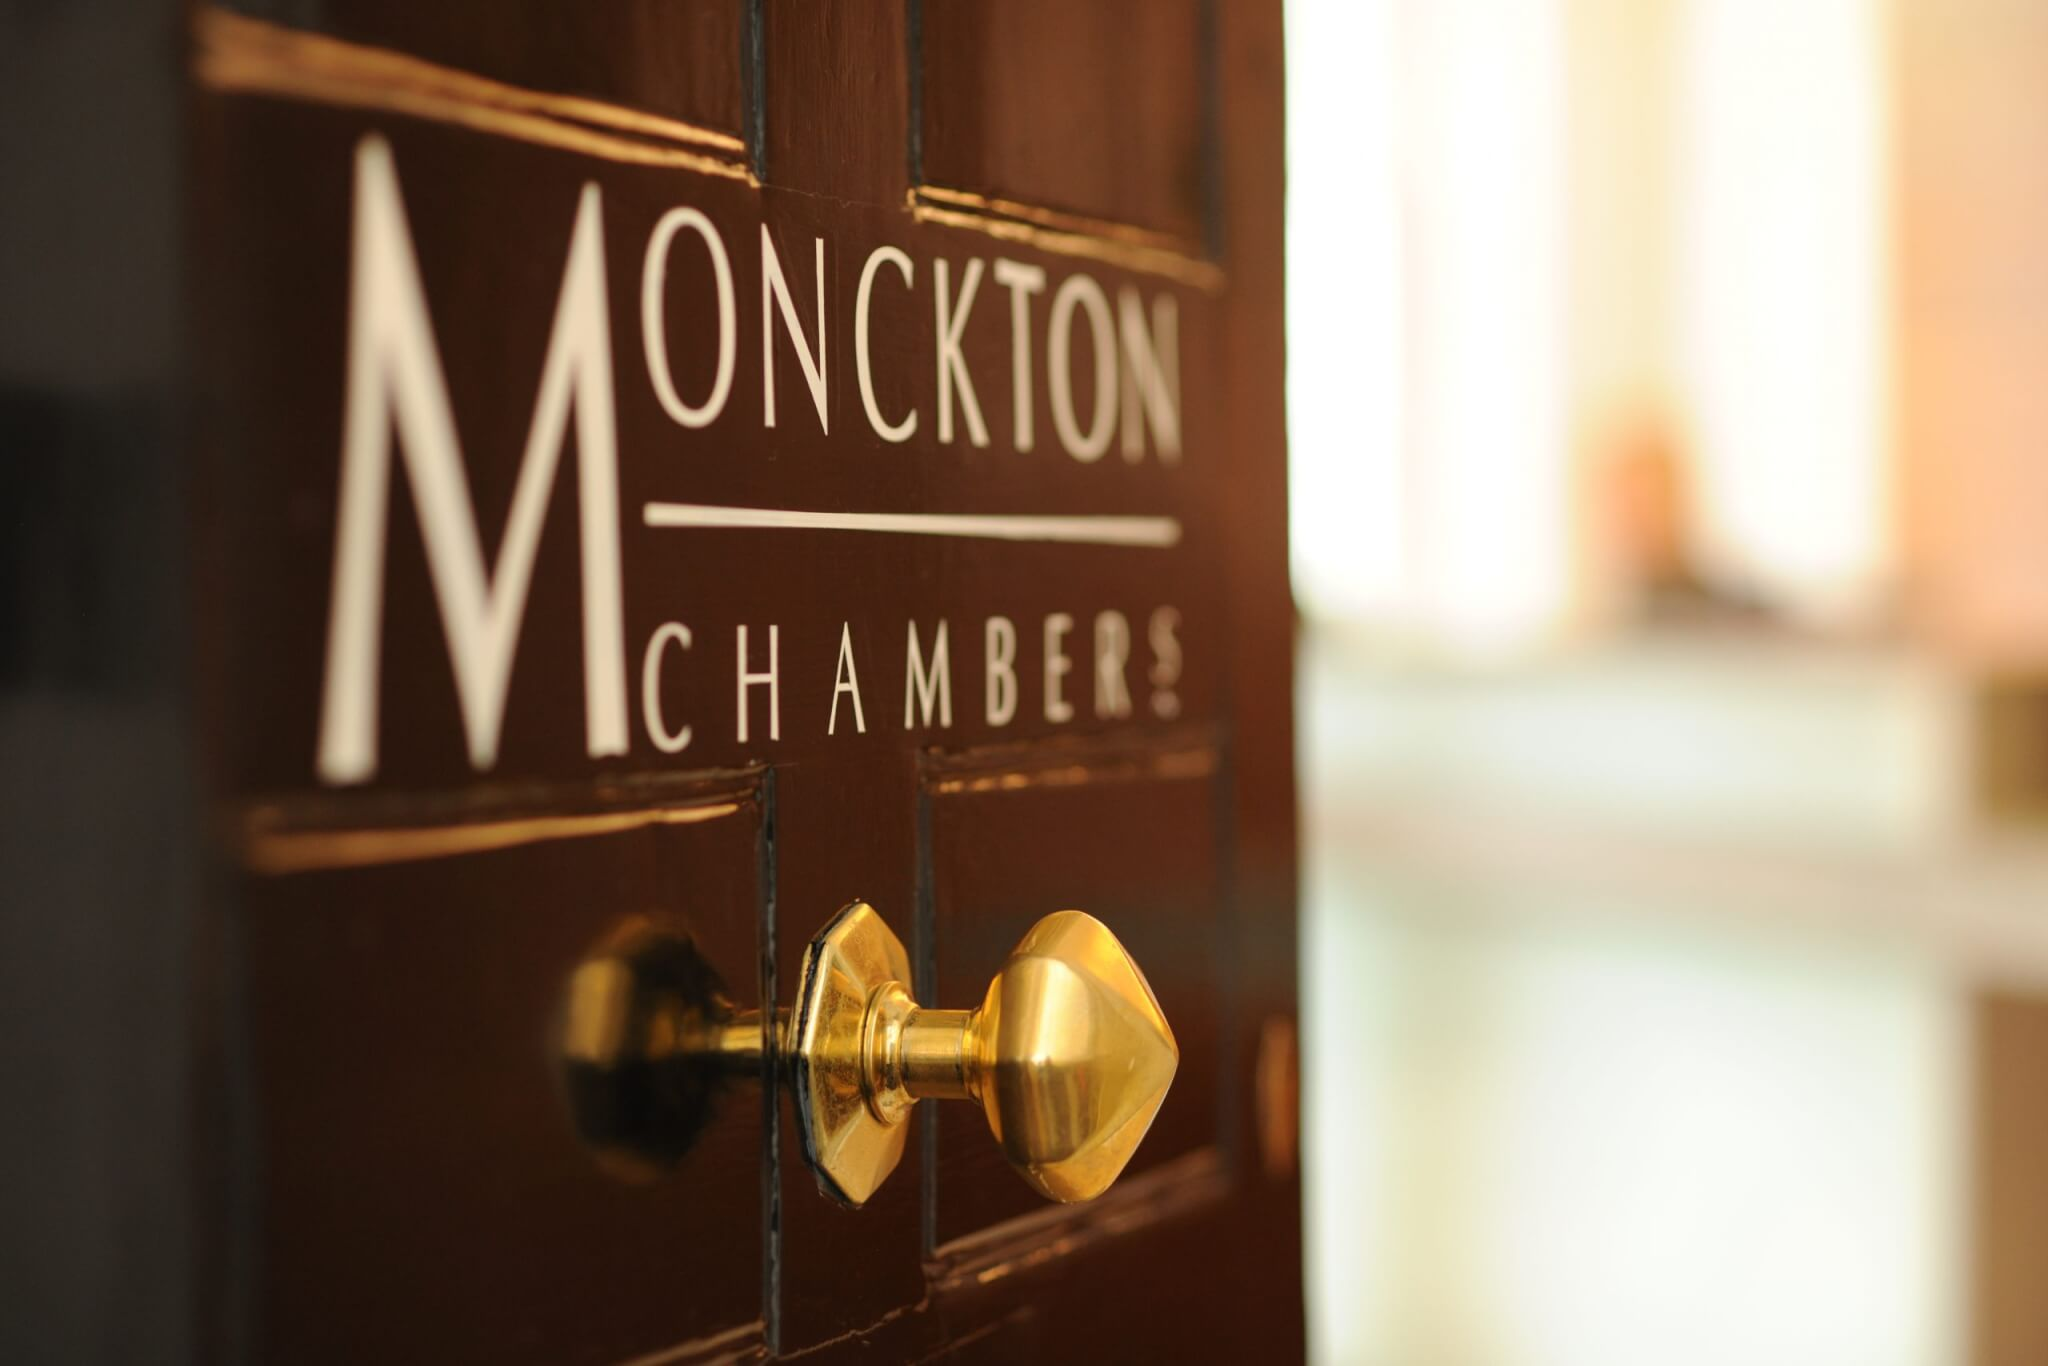 Why I chose Monckton Chambers